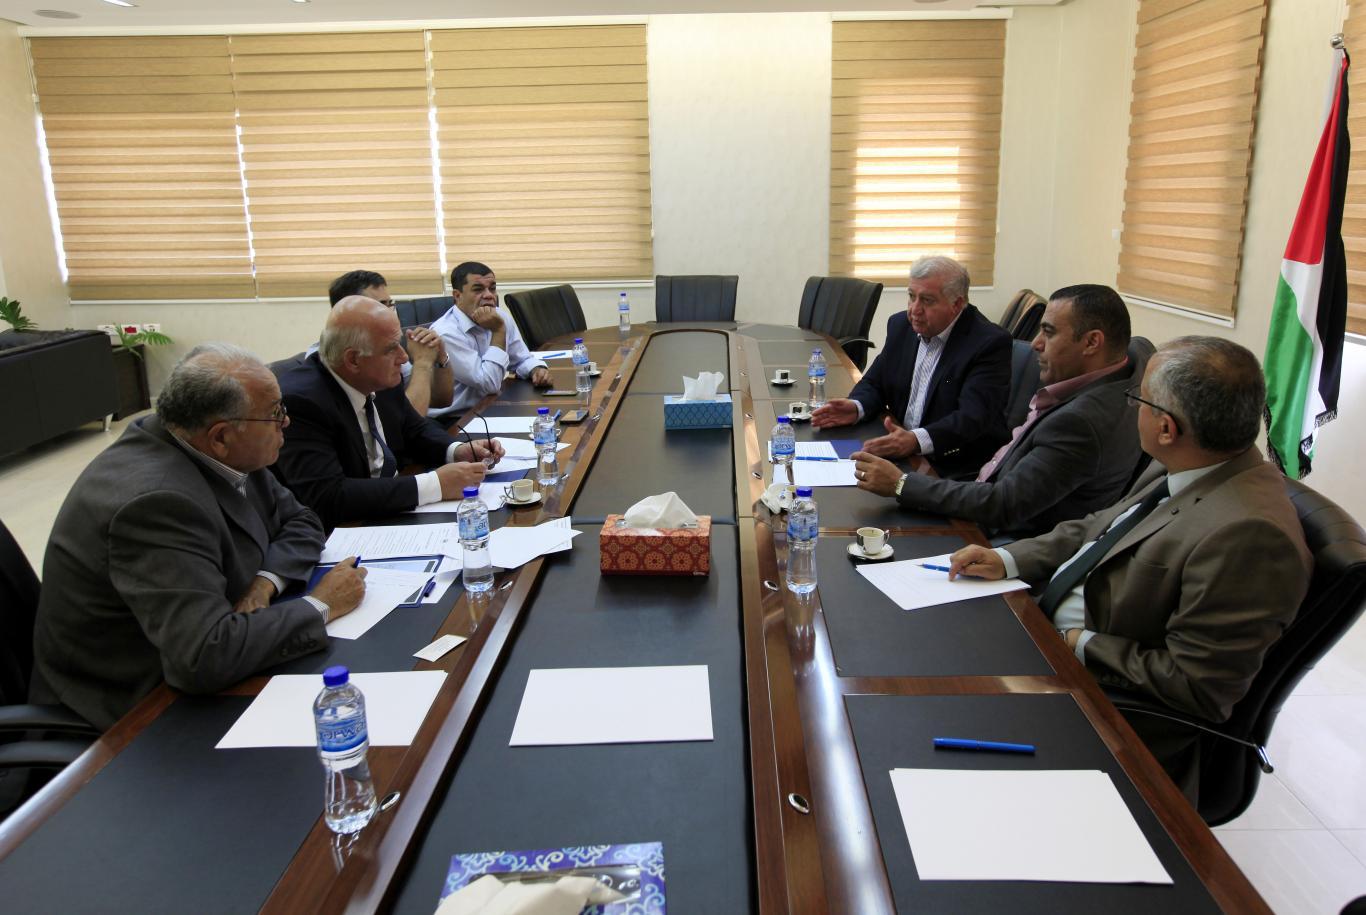 Reception of Palestinian Bar Association President in the Northern Mr. Khalid Zoubi